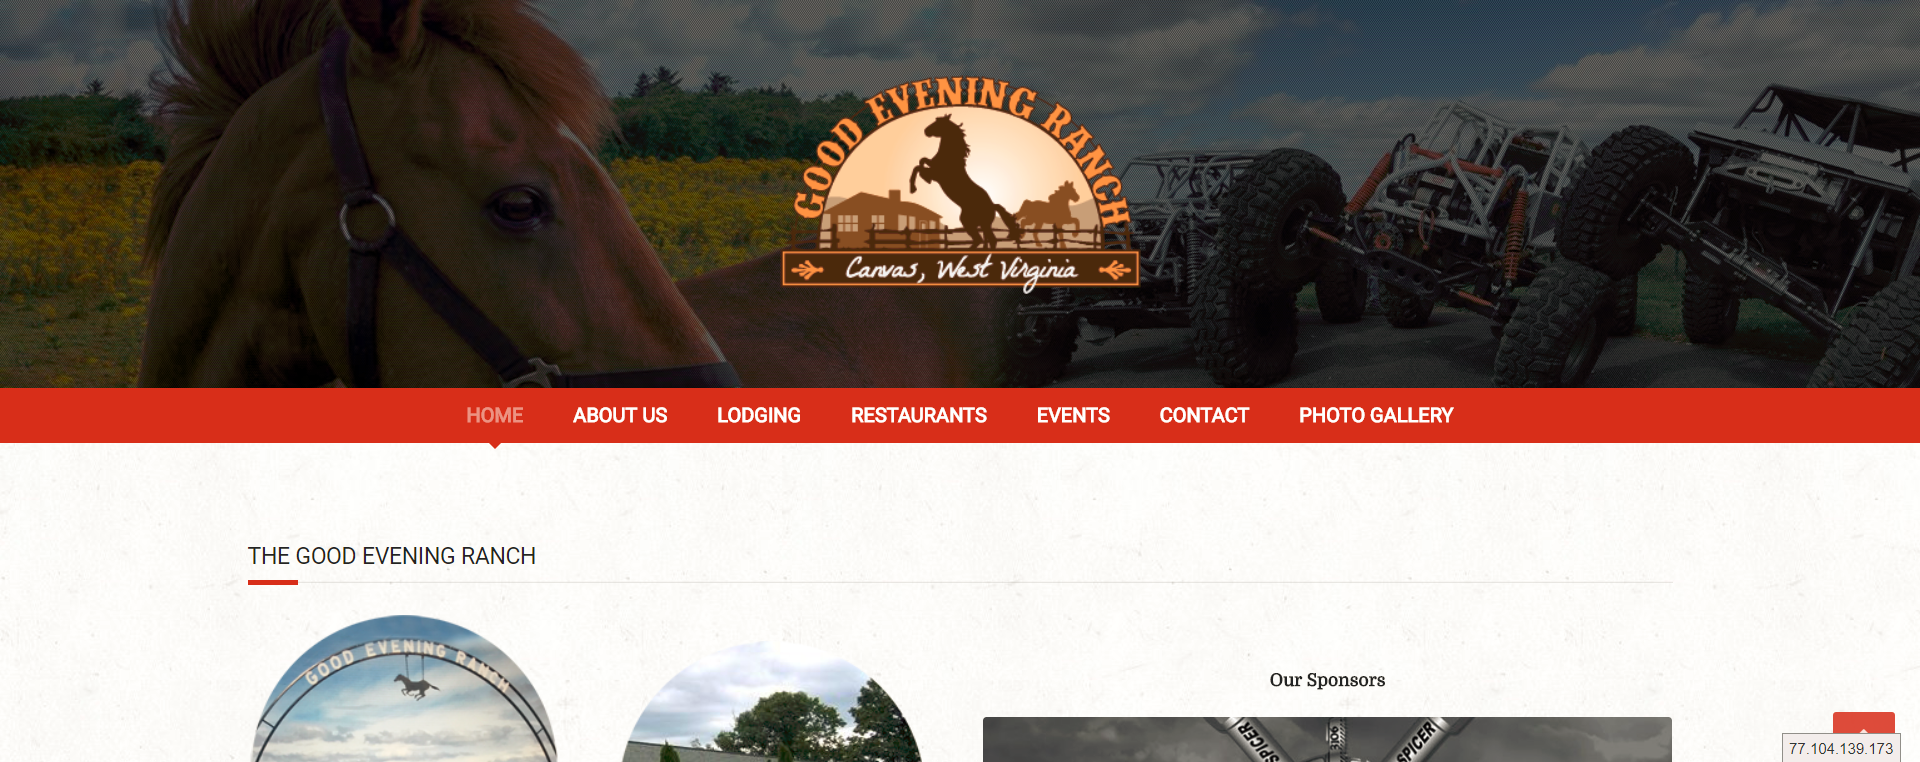 The Good Evening Ranch I Lodging Atv Confe_ Https___thegoodeveningranch Com_ The Good